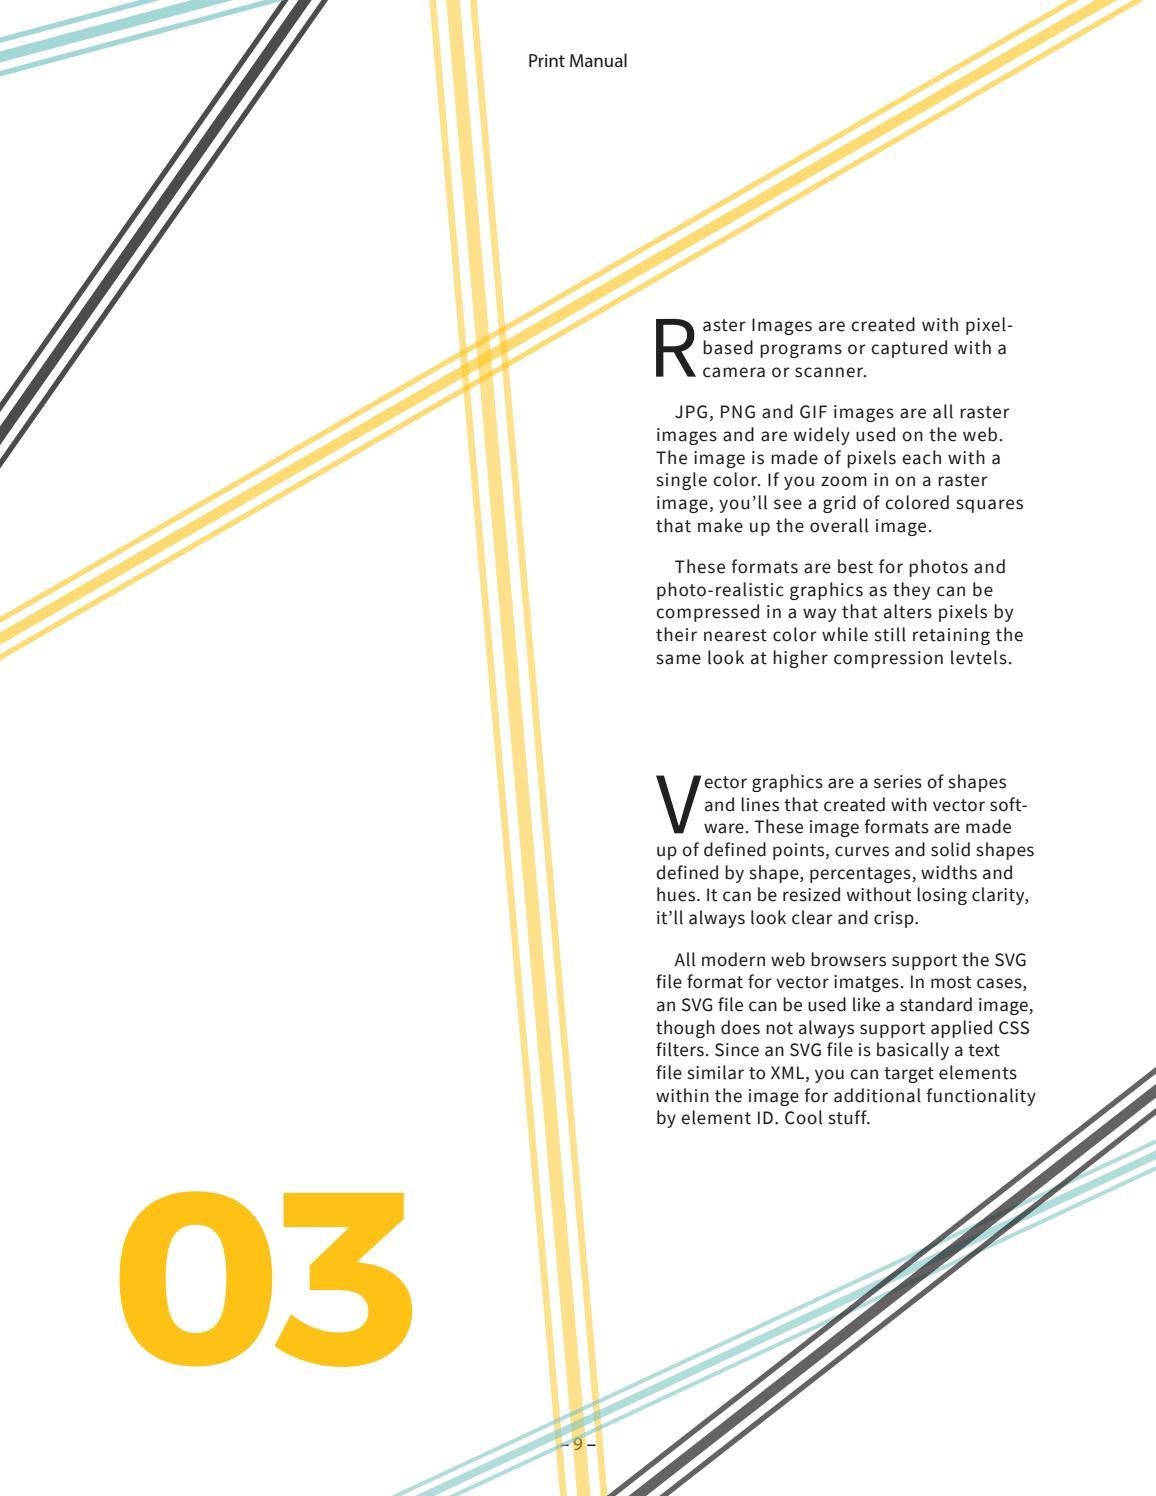 Print Manual 2017 By Qing Y Issuu